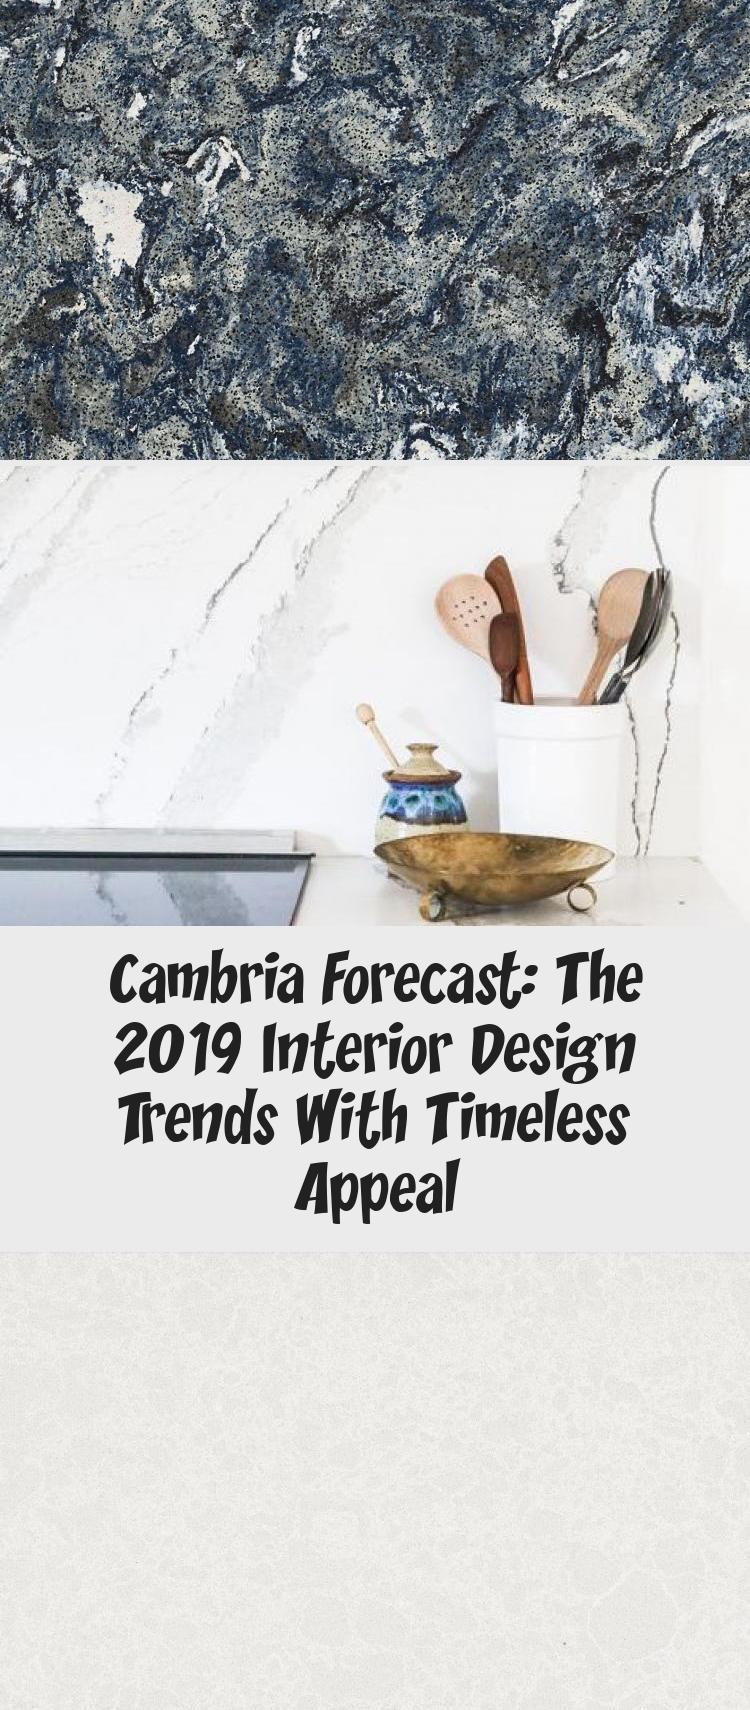 Cambria Forecast: The 2019 Interior Design Trends With ...